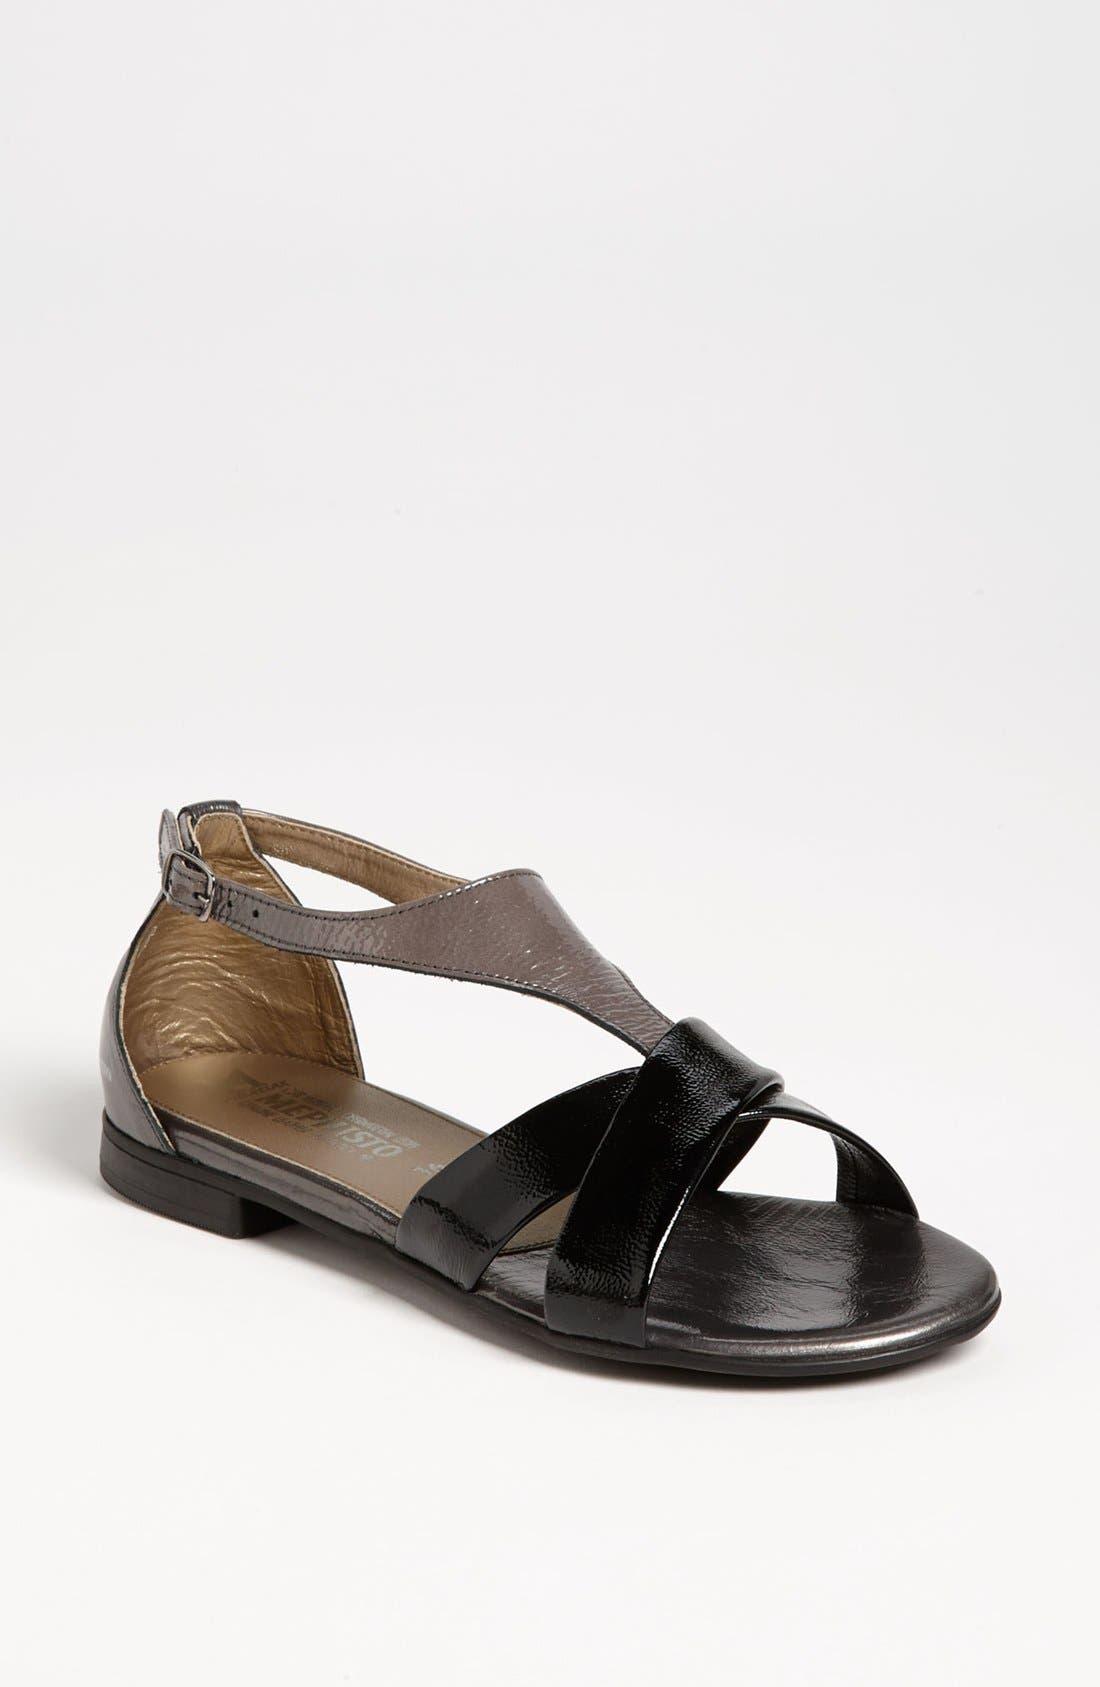 Alternate Image 1 Selected - Mephisto 'Zazia' Sandal